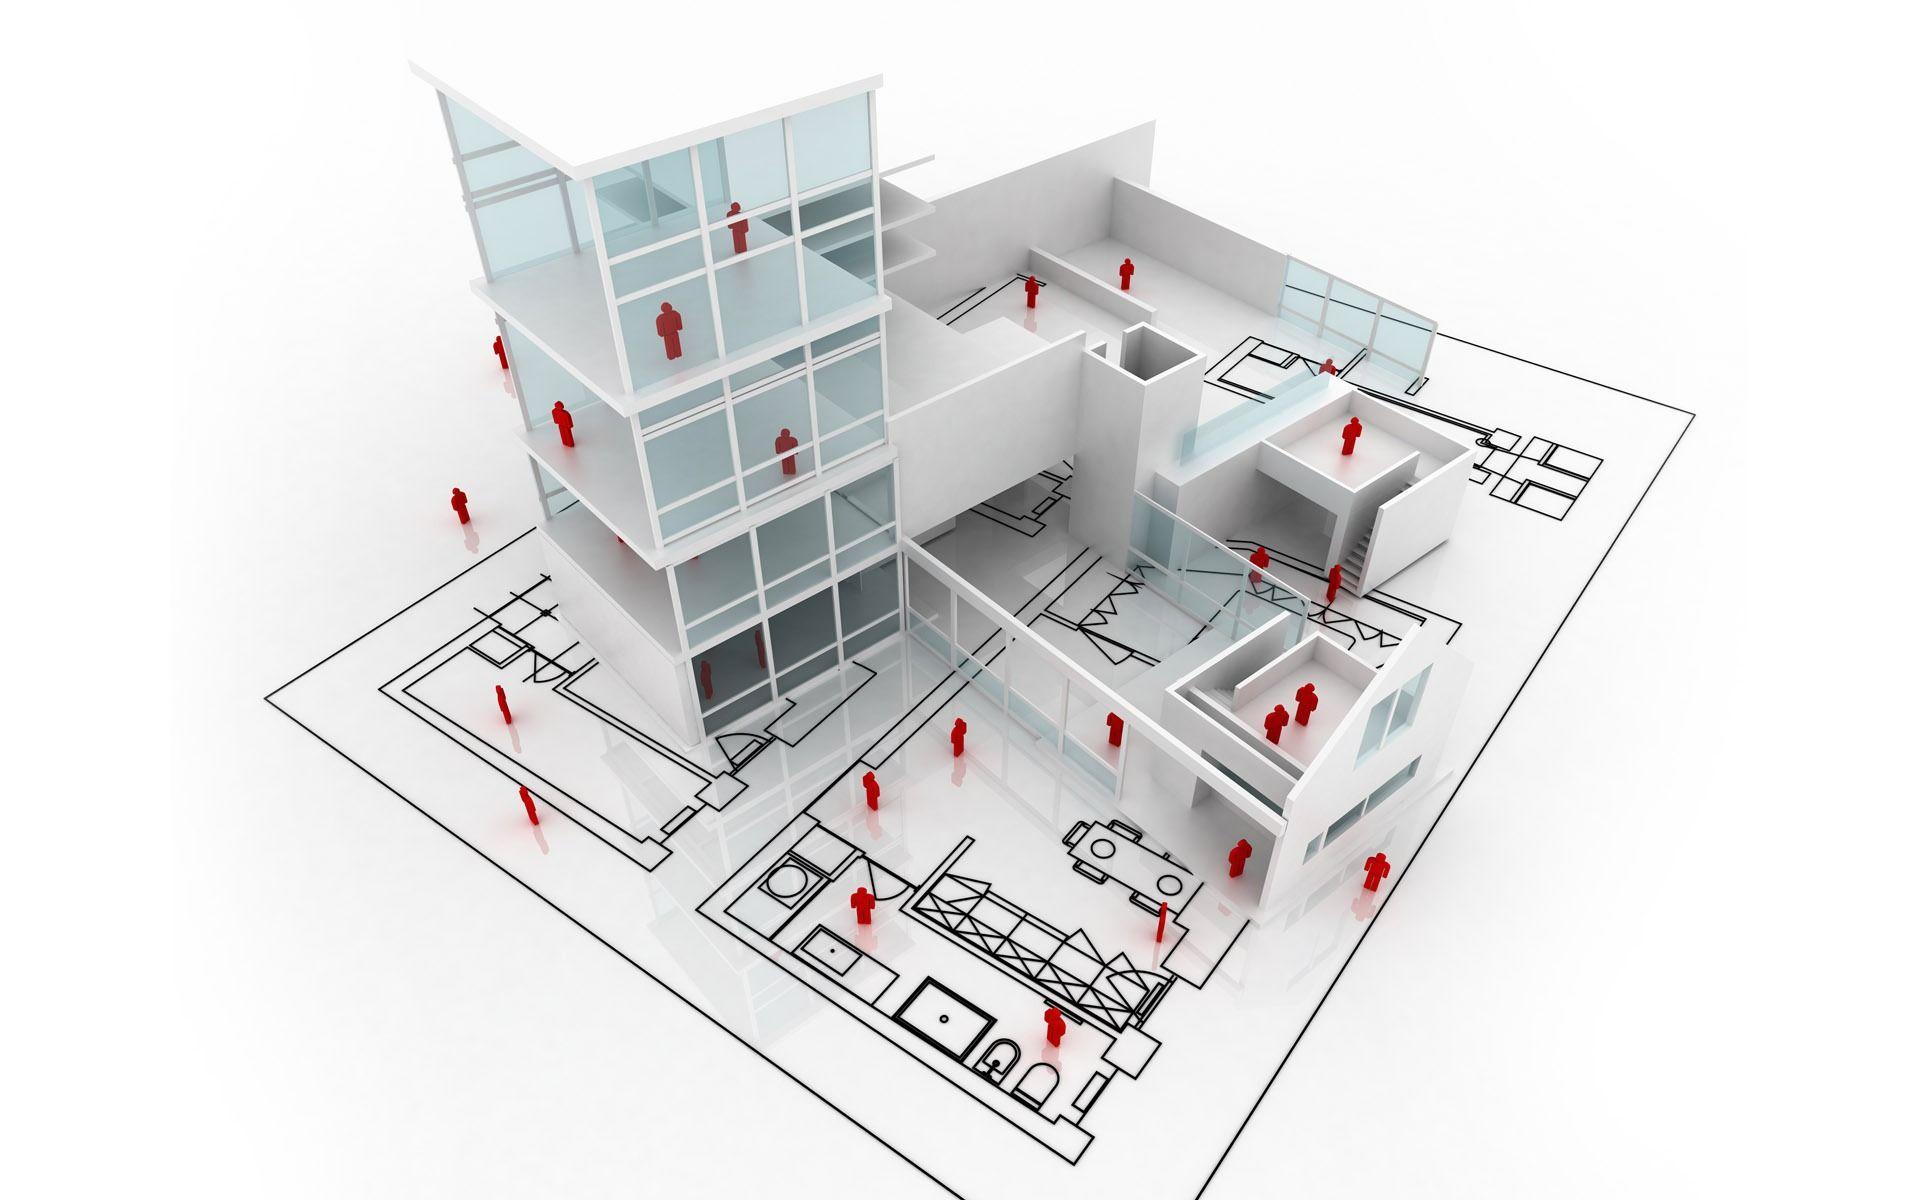 1000+ images about Plan on Pinterest partment floor plans ... - ^